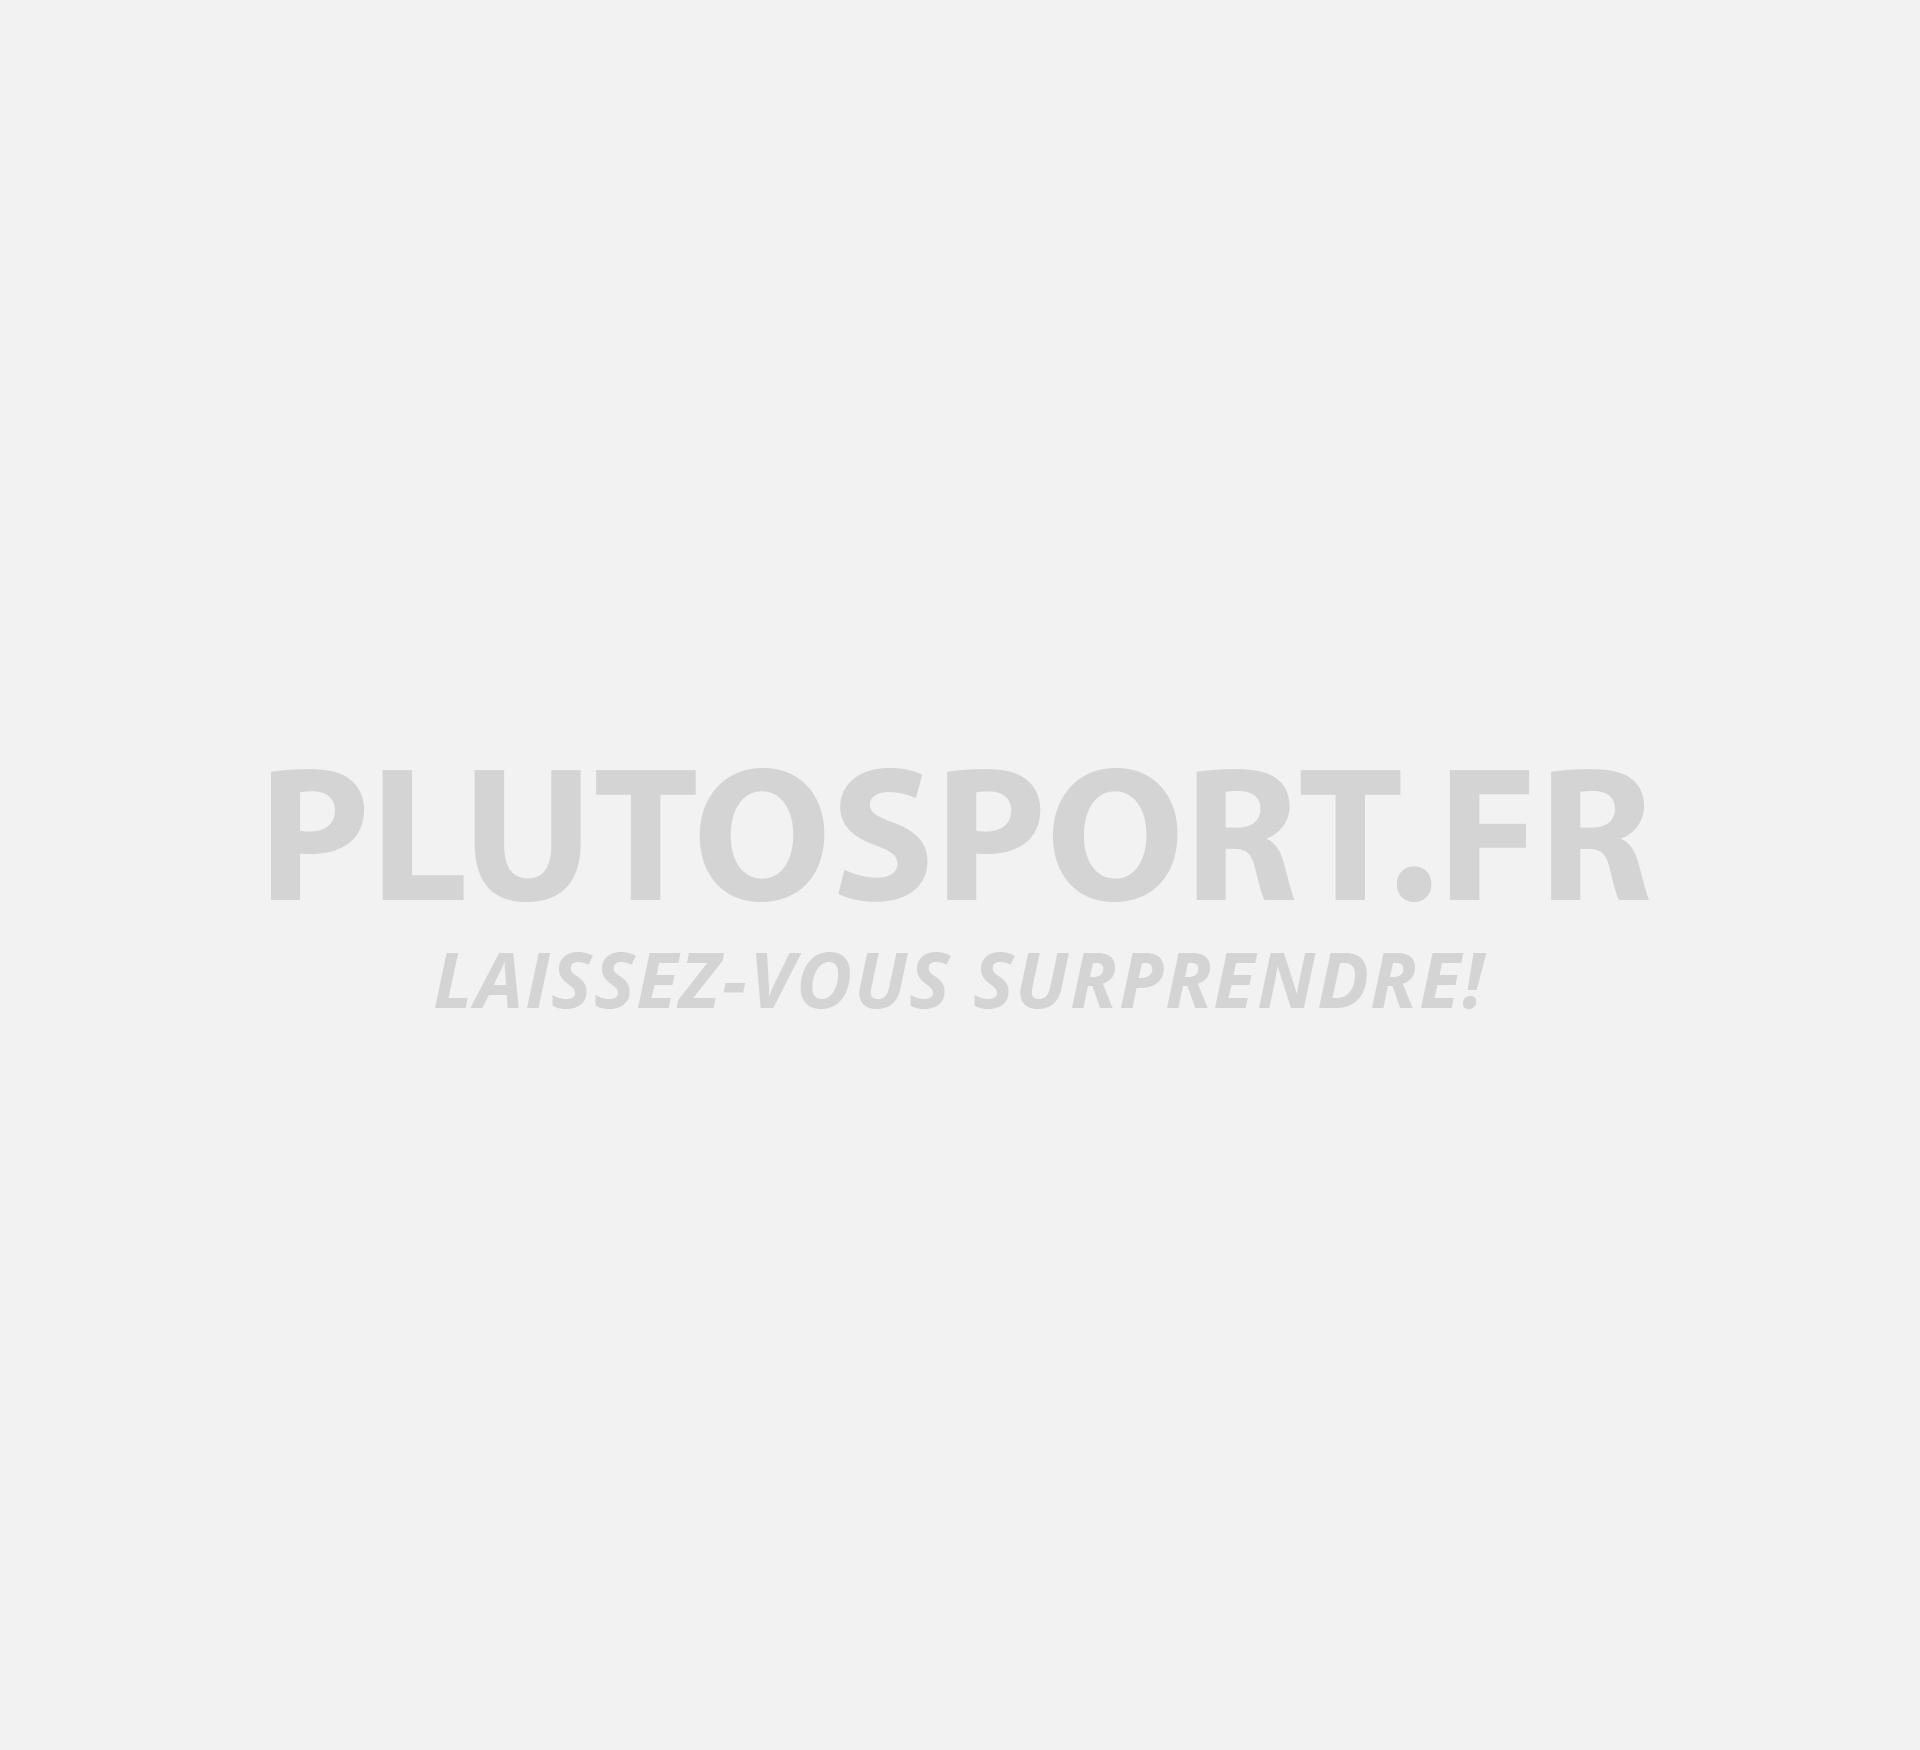 gs Presto Baskets Fly Nike Chaussures Pour Enfants 1HqTAf0w